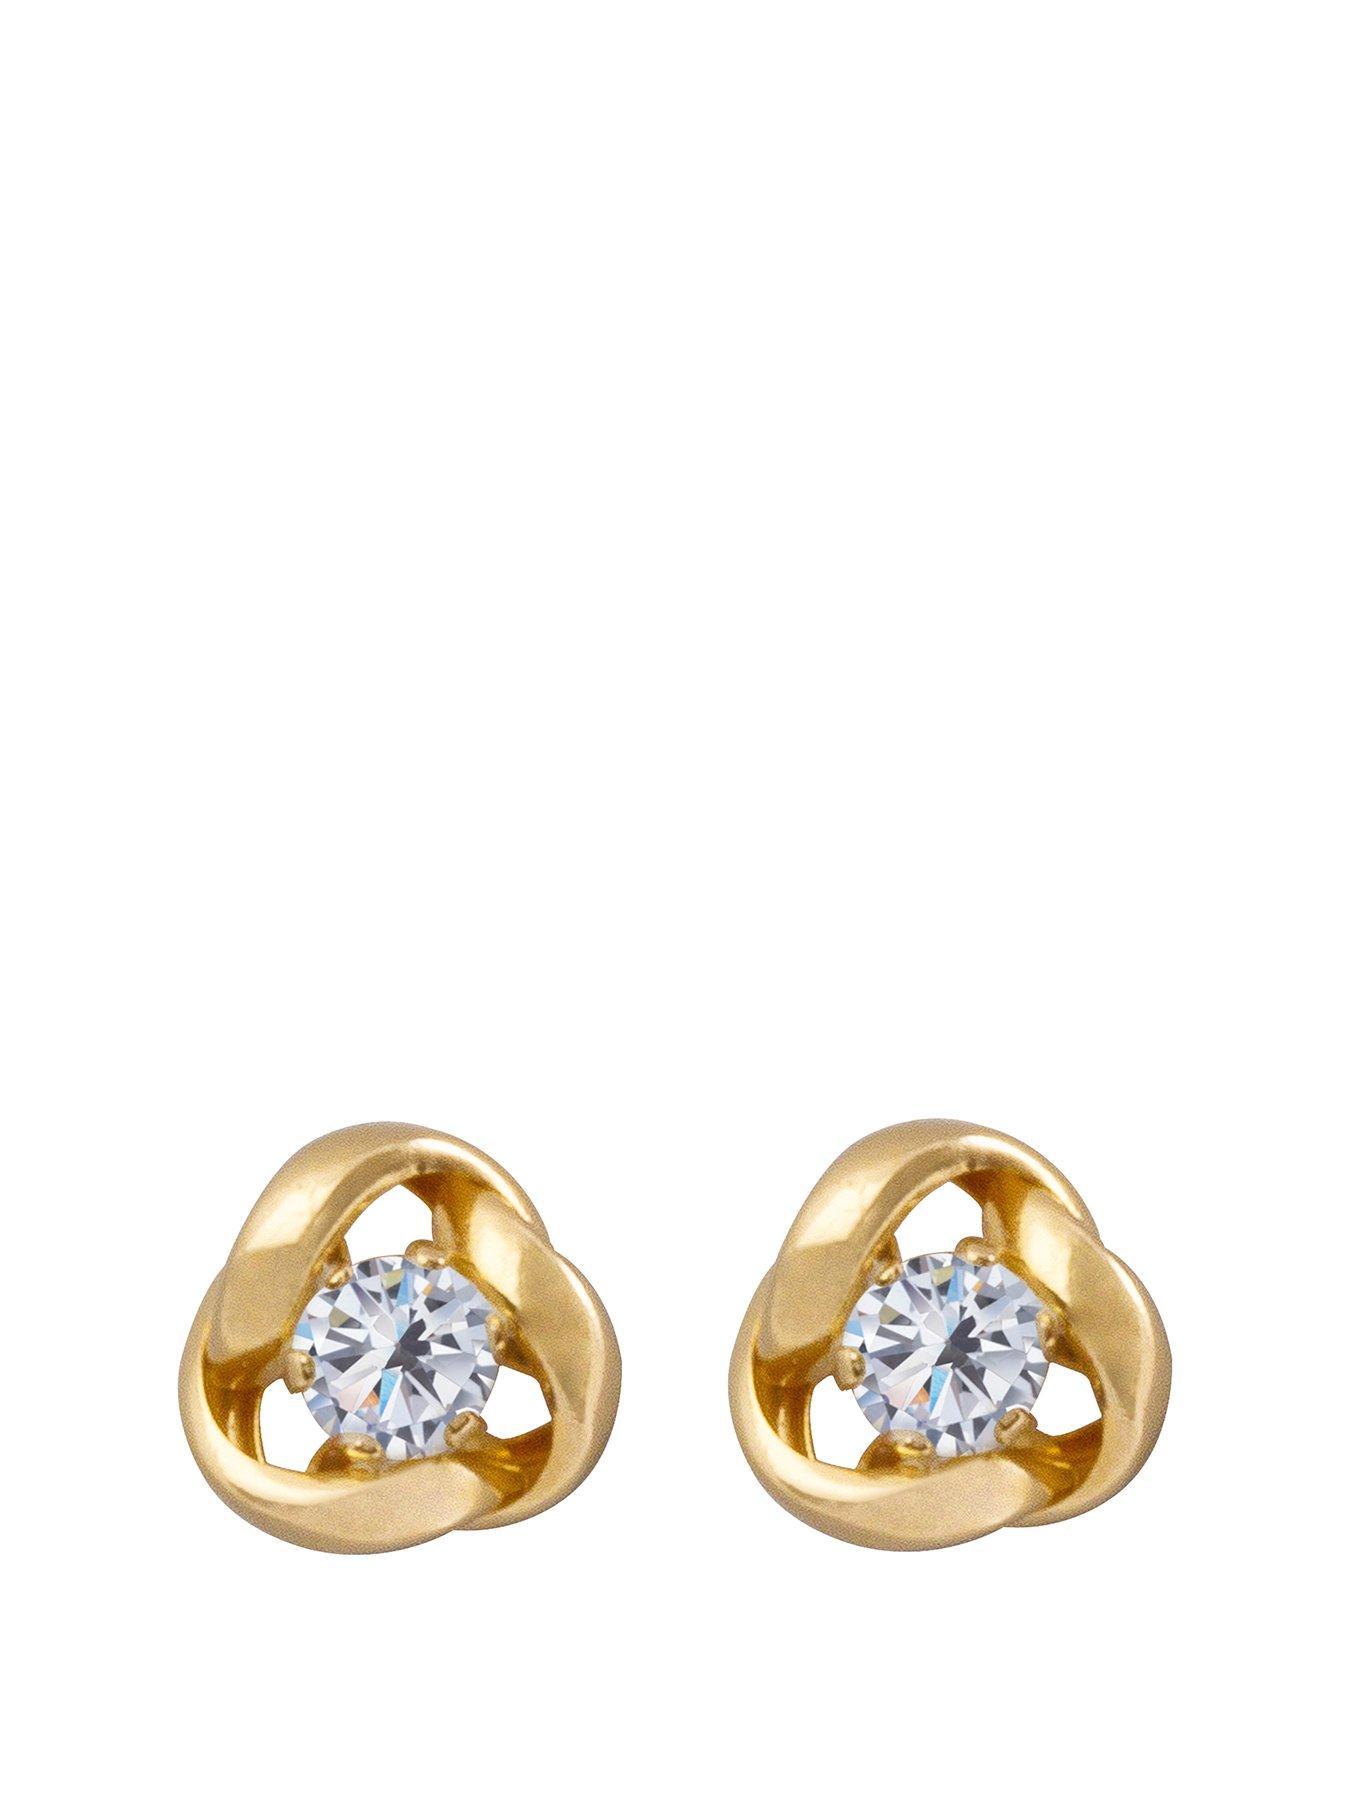 Giftbox 9ct yellow gold 7mm Tanzanite cubic zirconia CZ stud earrings Studs